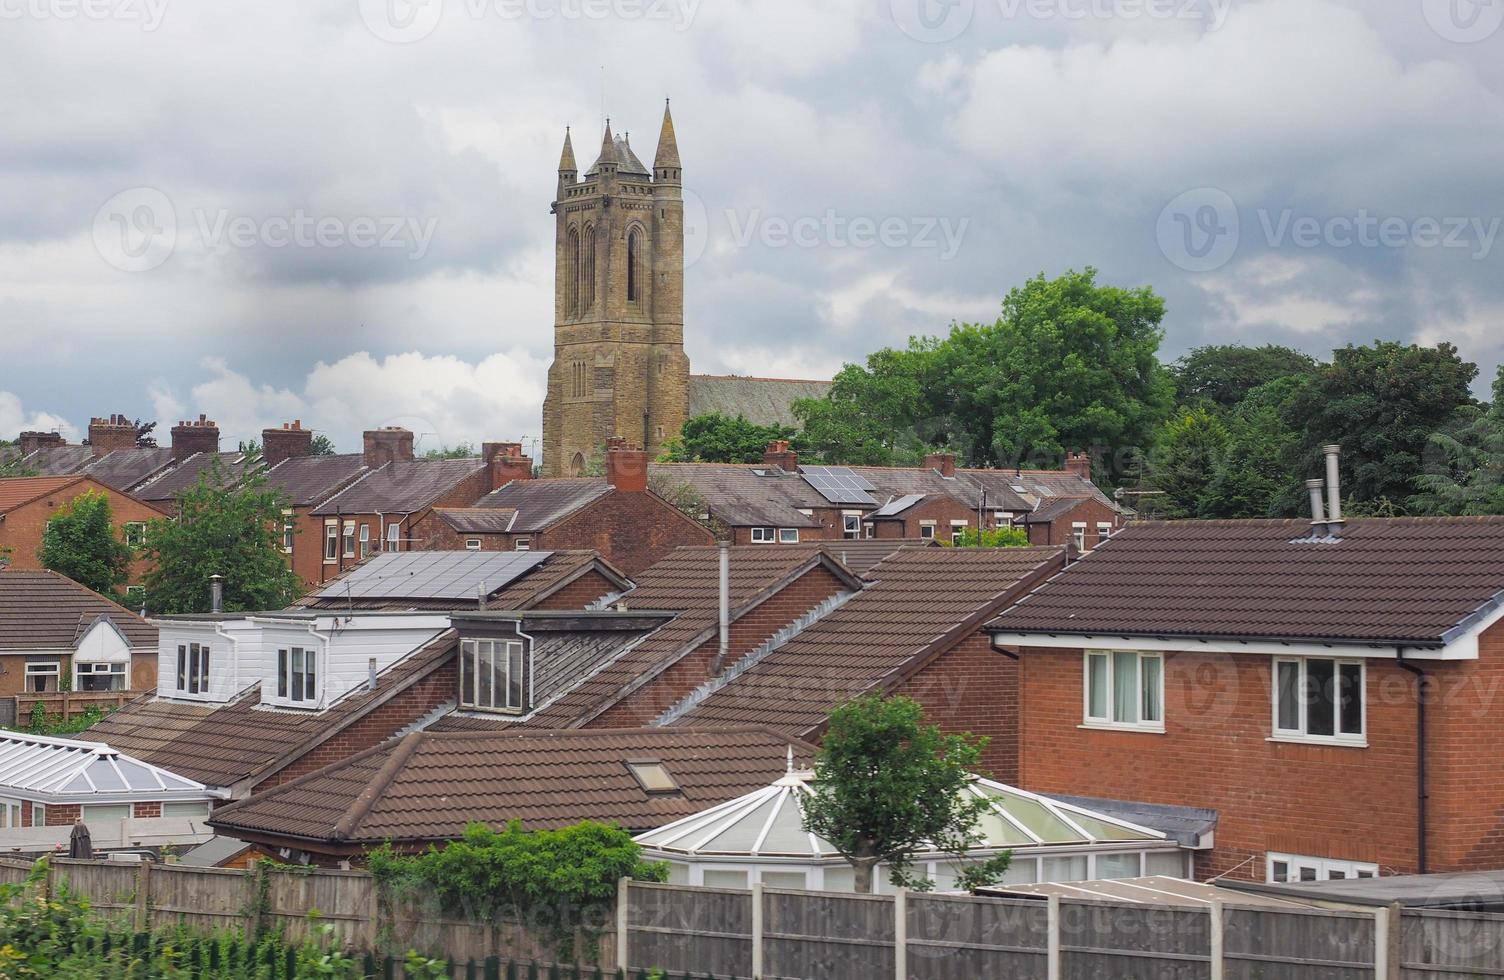 View of Leyland photo